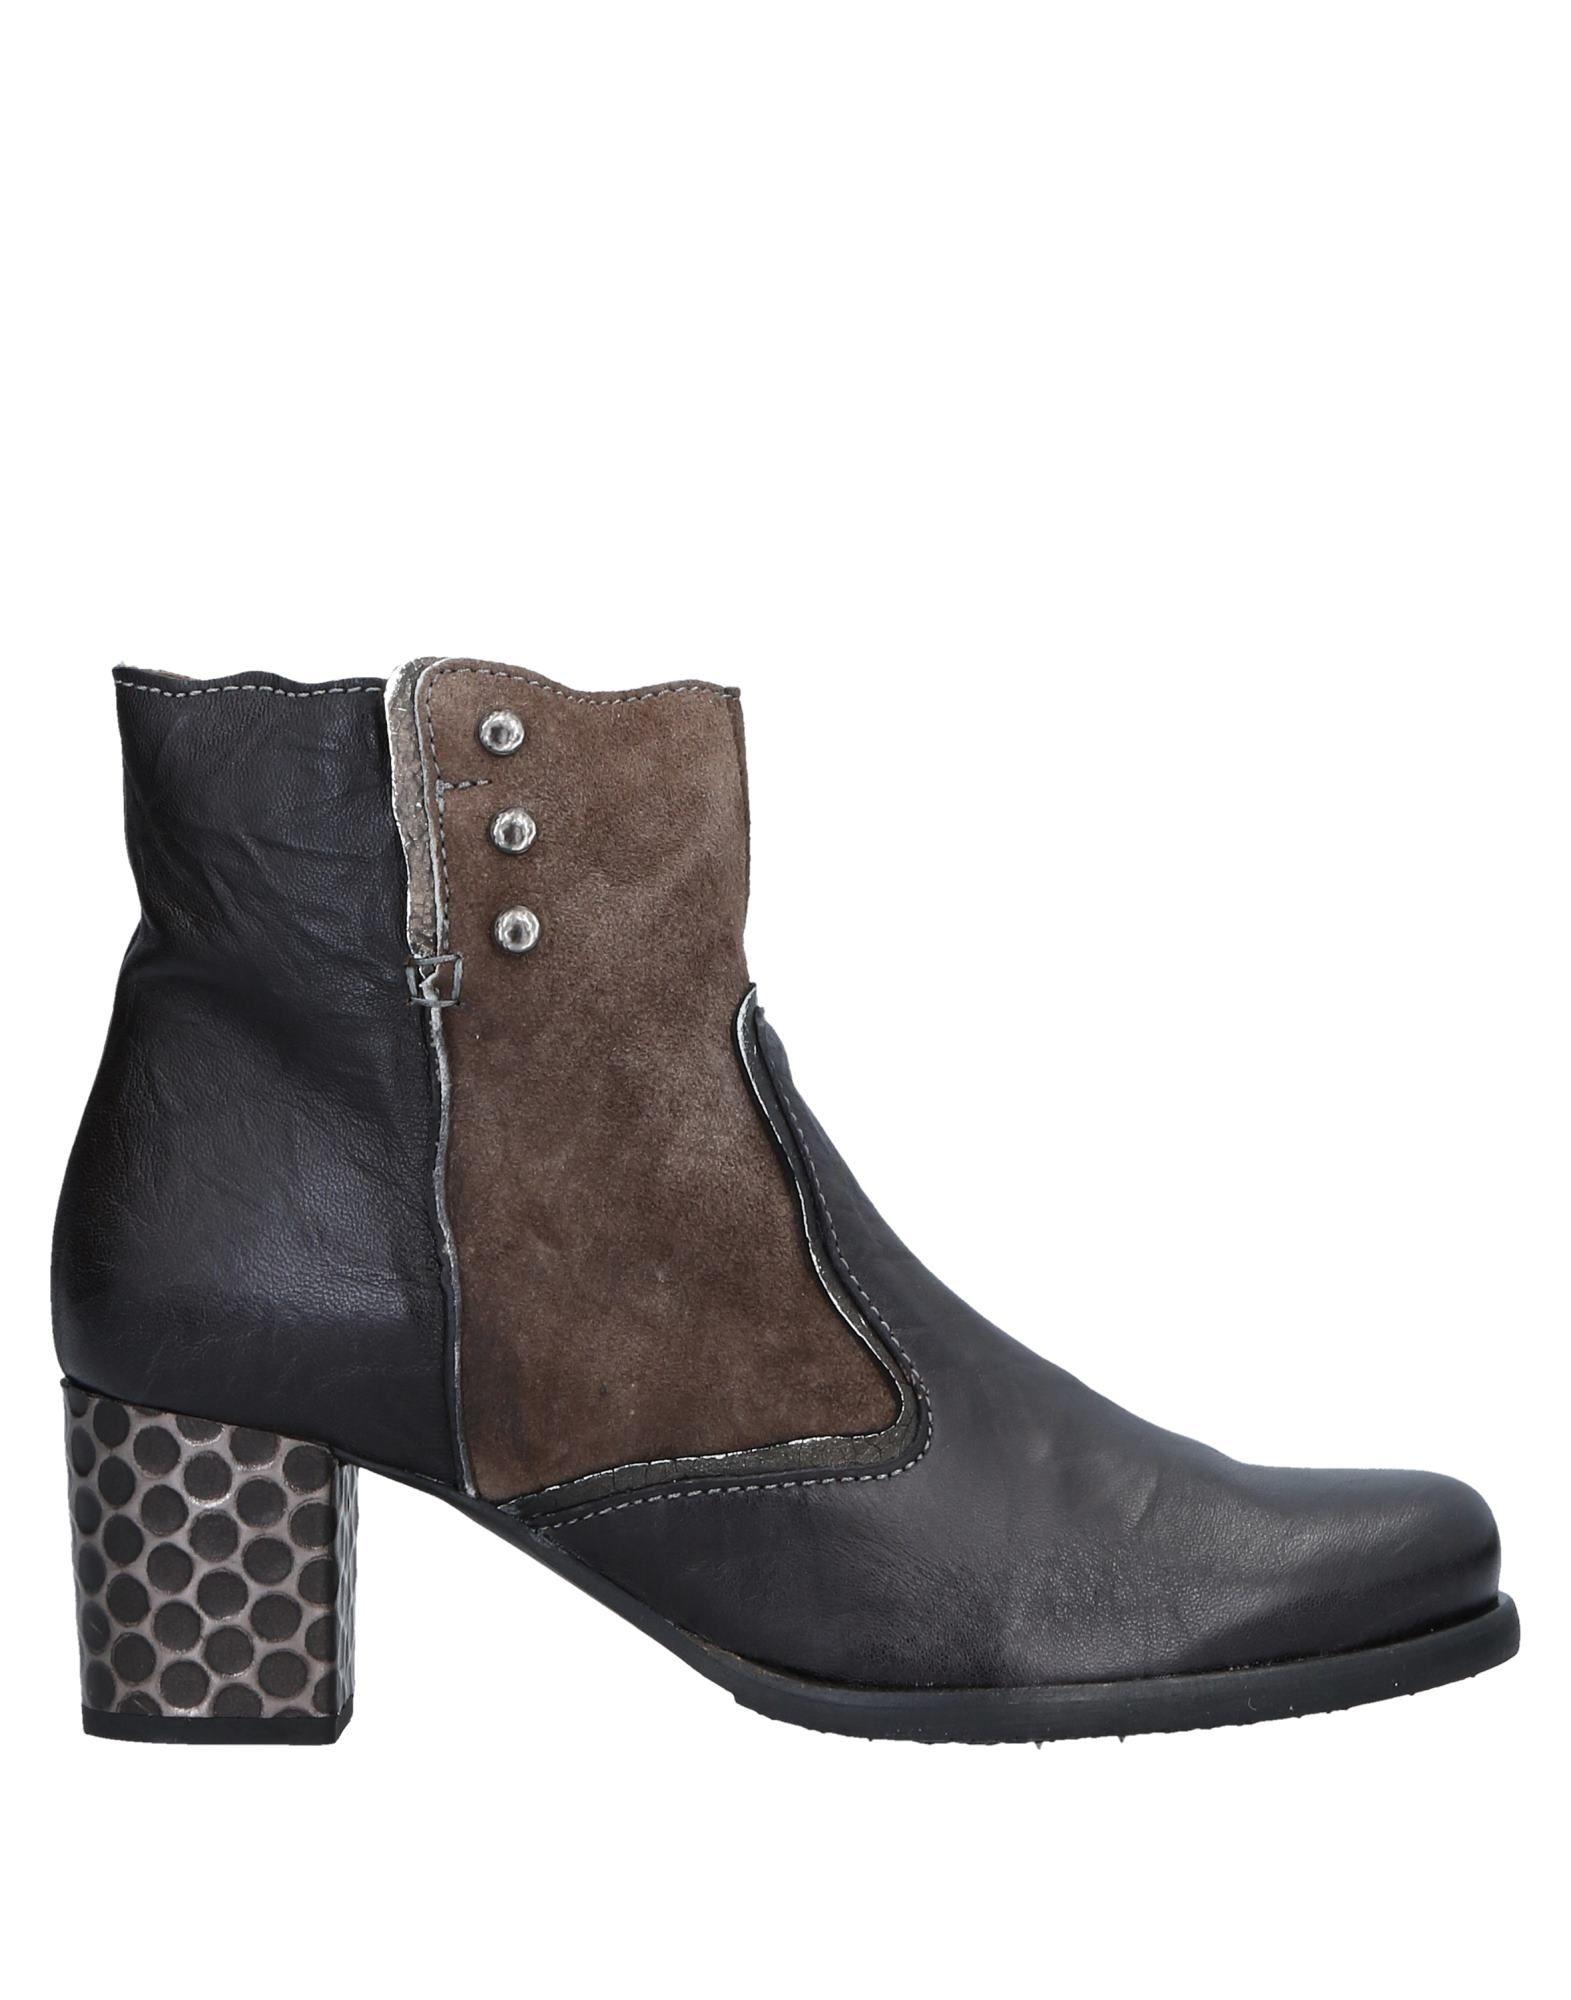 CLOCHARME | CLOCHARME Ankle boots | Goxip